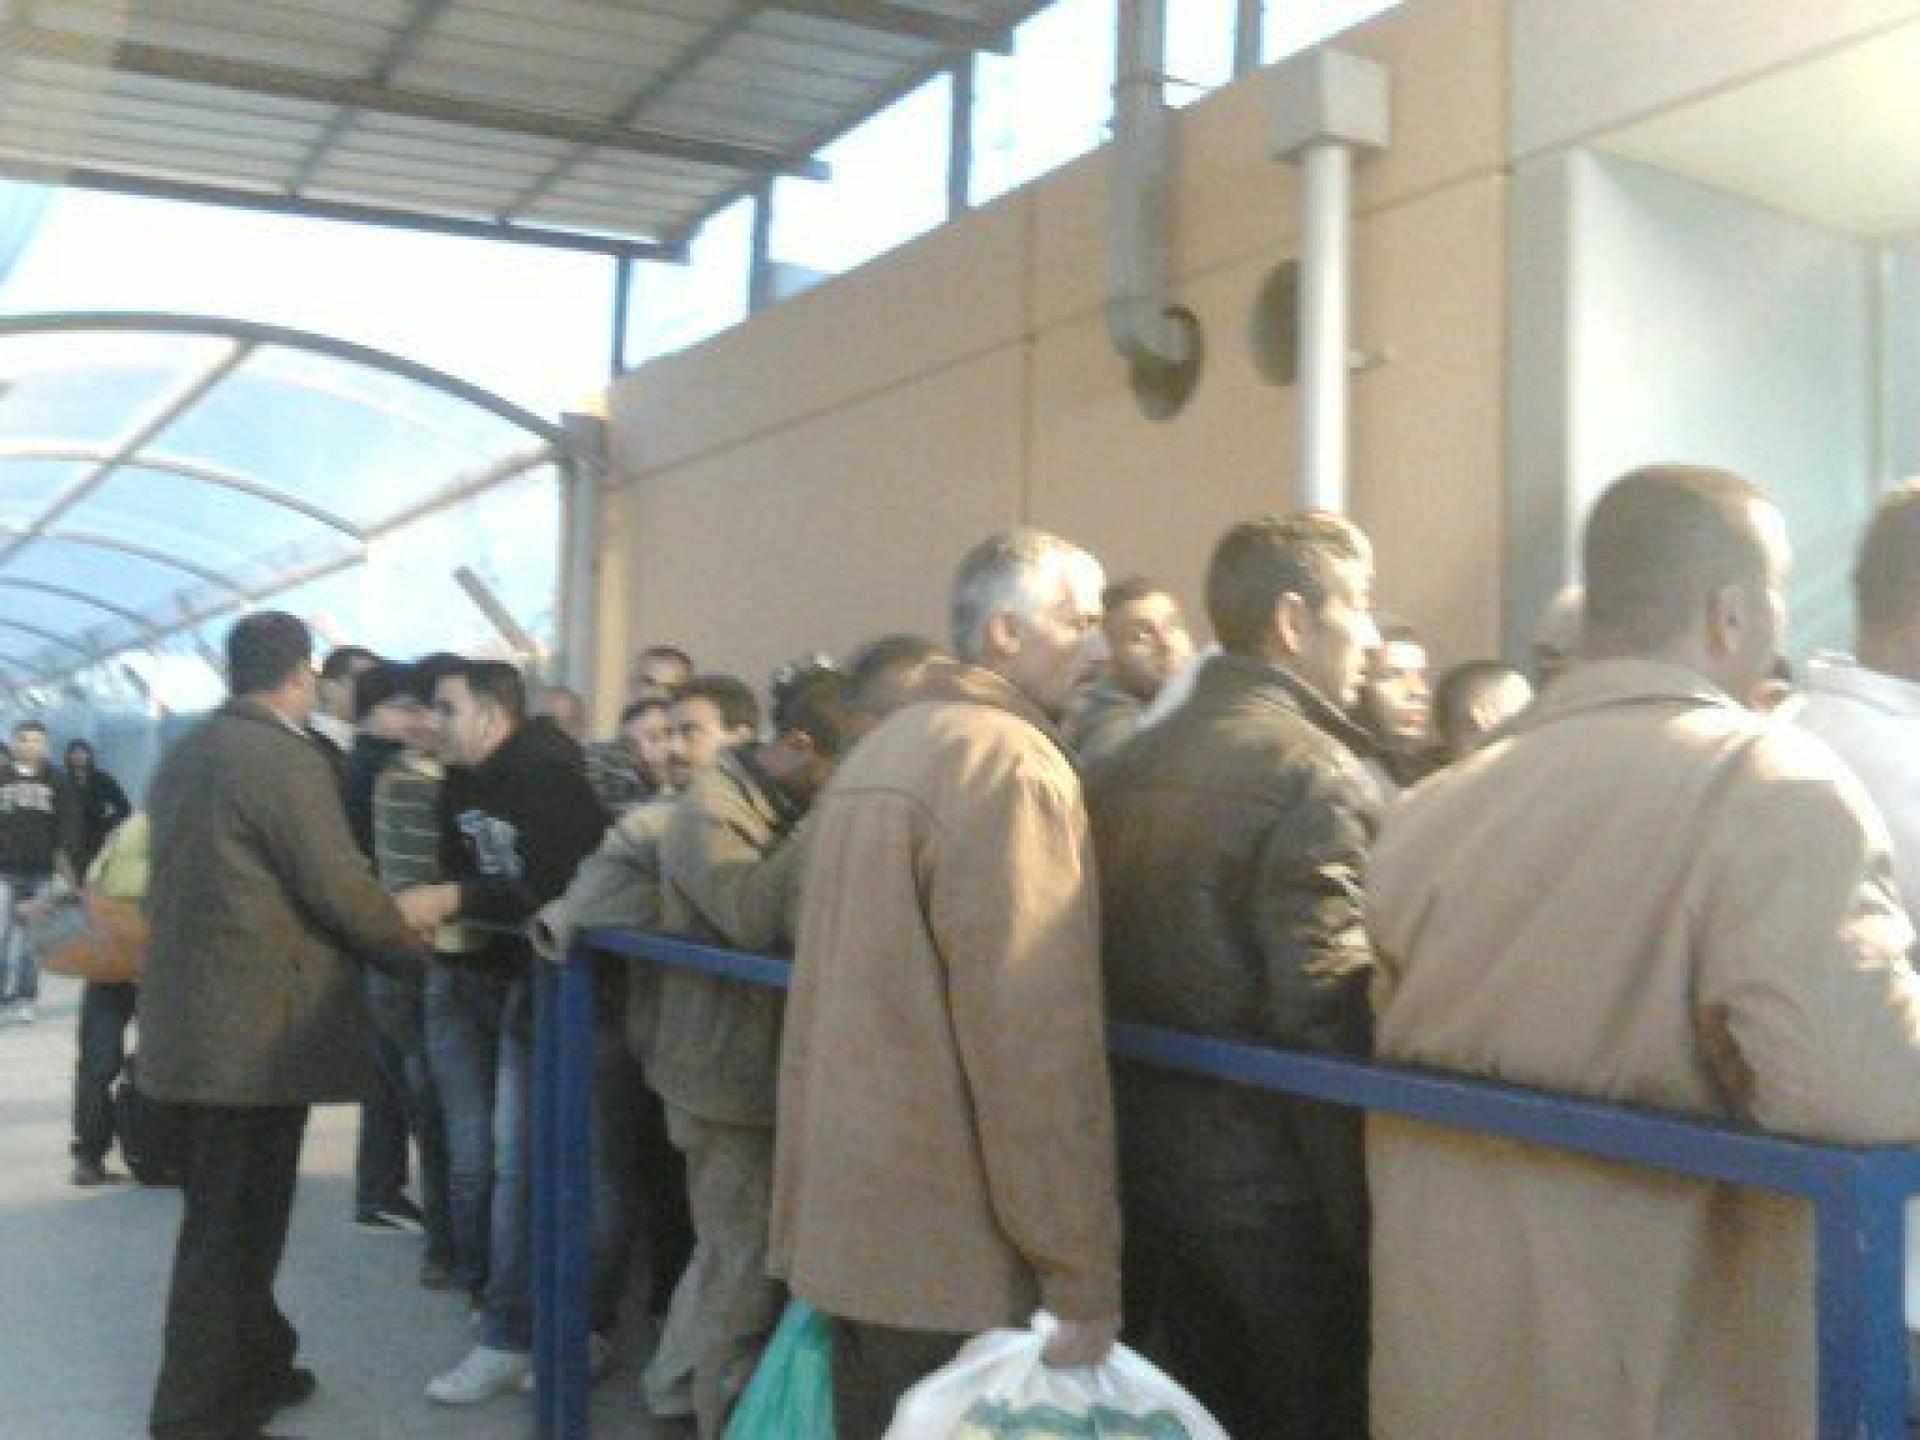 Barta'a/Reikhan checkpoint 25.02.13